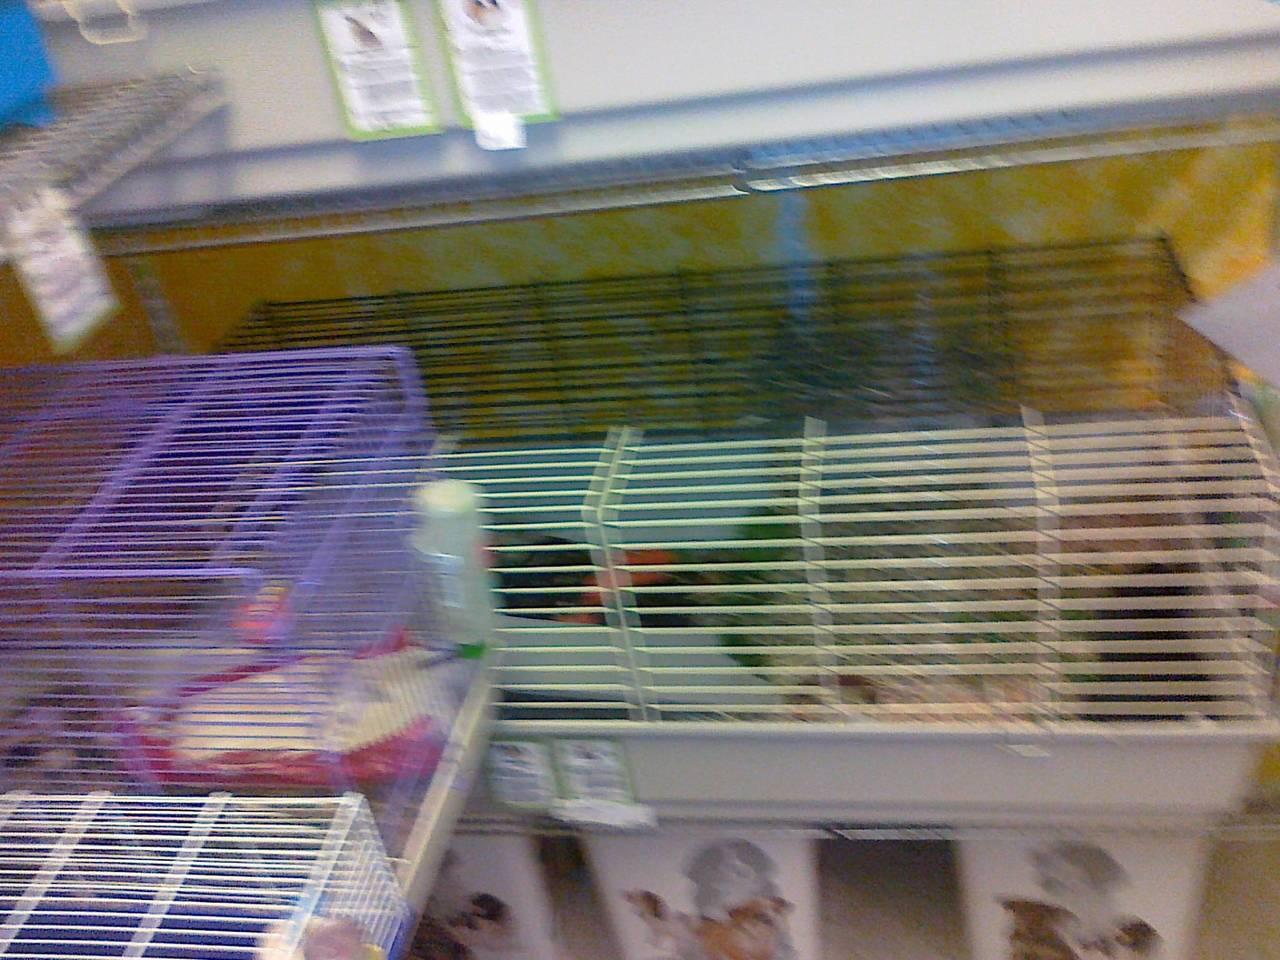 Hamster aus der Zoohandlung  - AUFKLÄRUNG